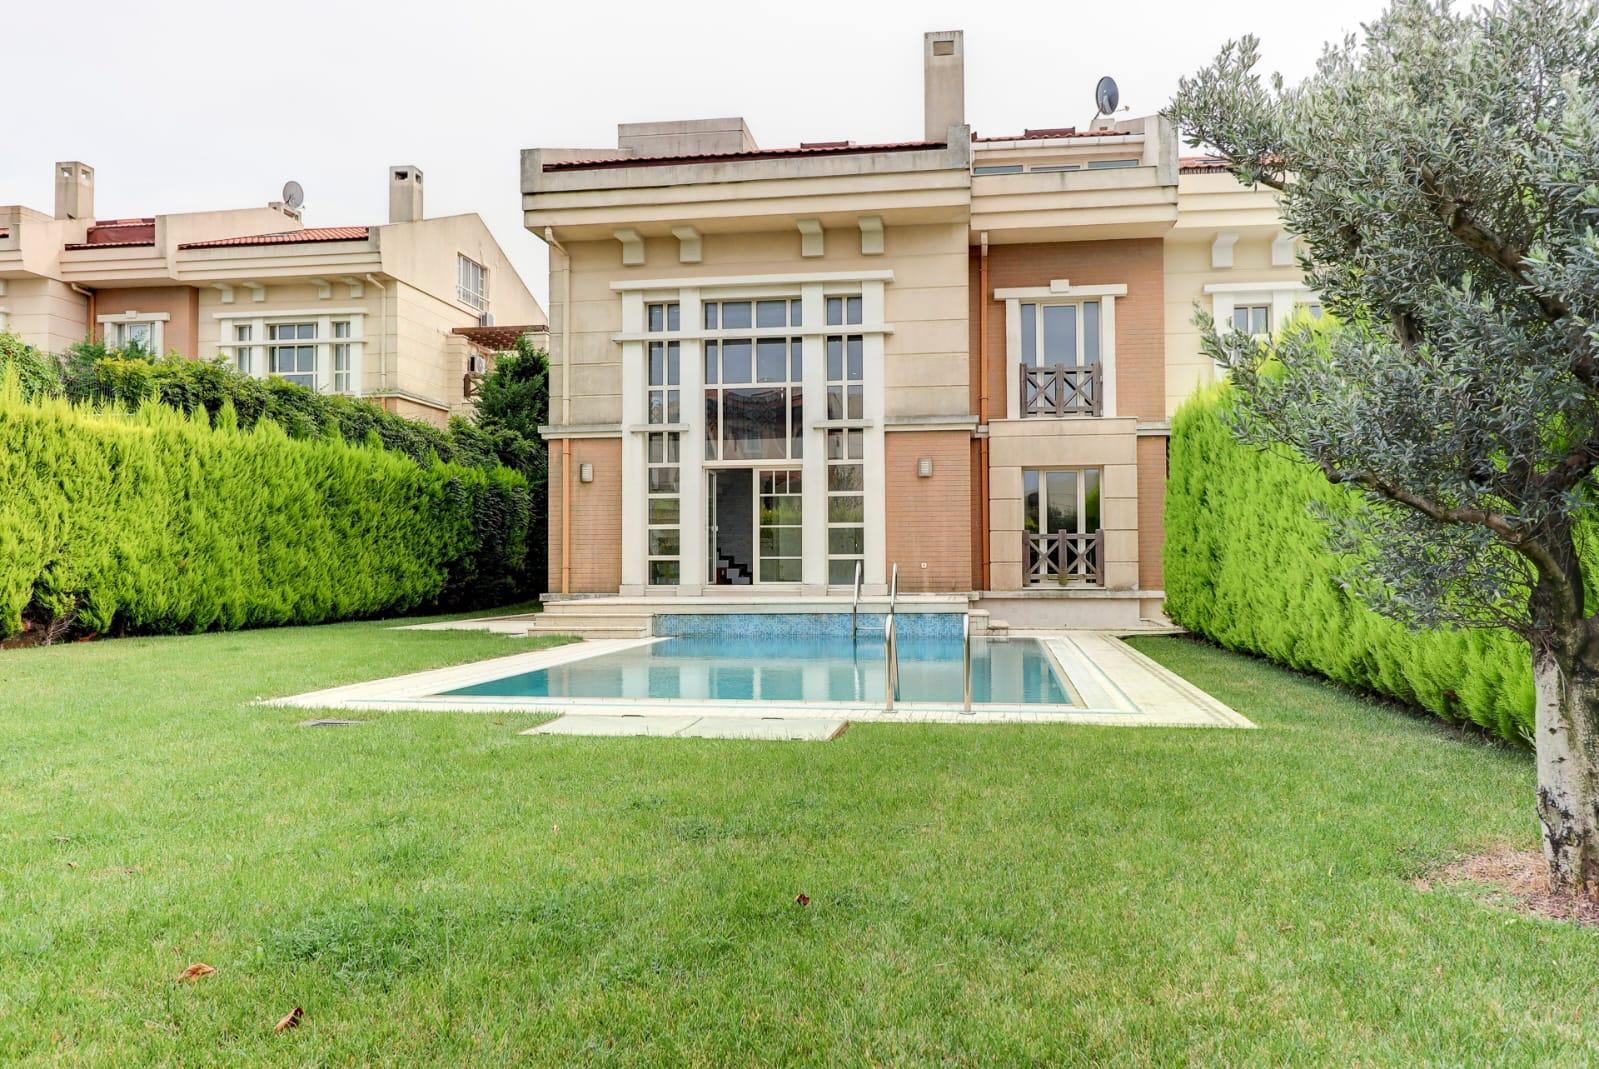 kilyos-villa-istanbul-property002.jpg